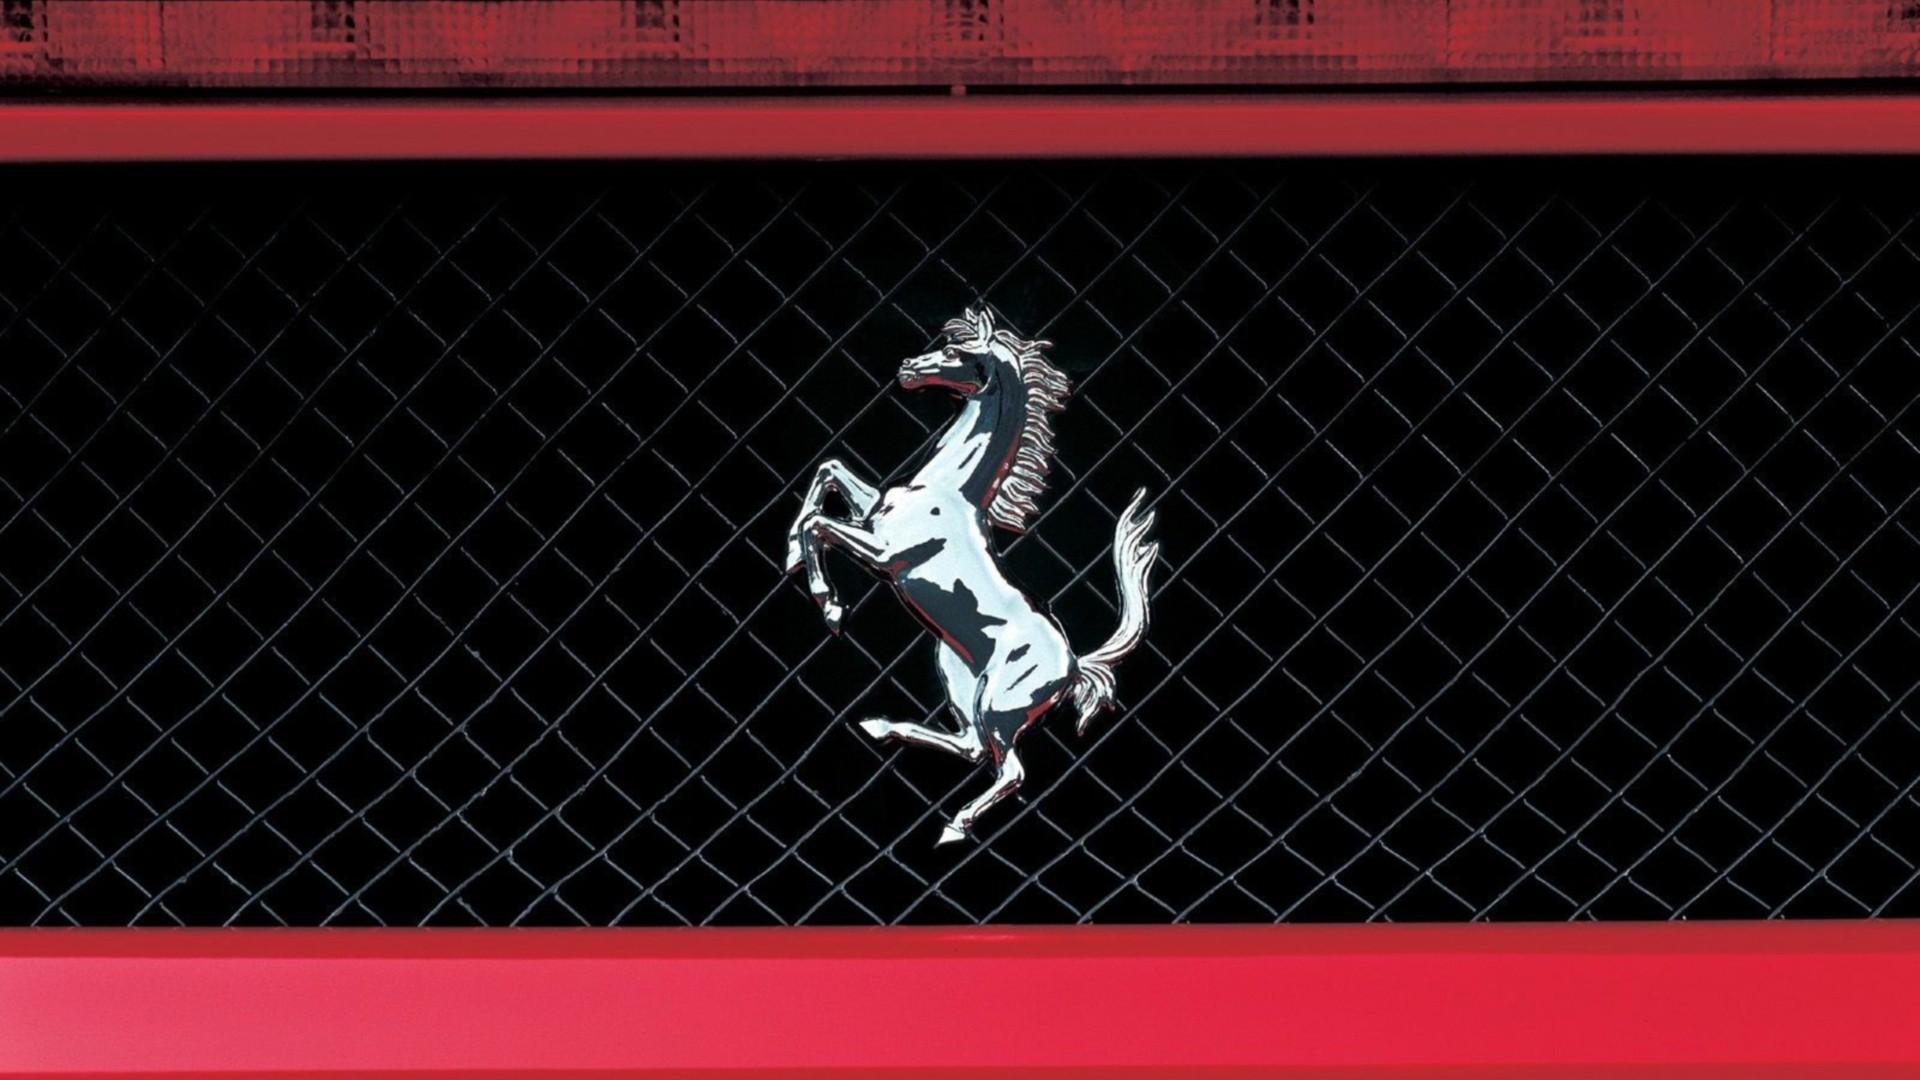 Top Wallpaper Logo Ferrari - car-red-horse-logo-Ferrari-stage-screenshot-performing-arts-234643  Collection_725783.jpg